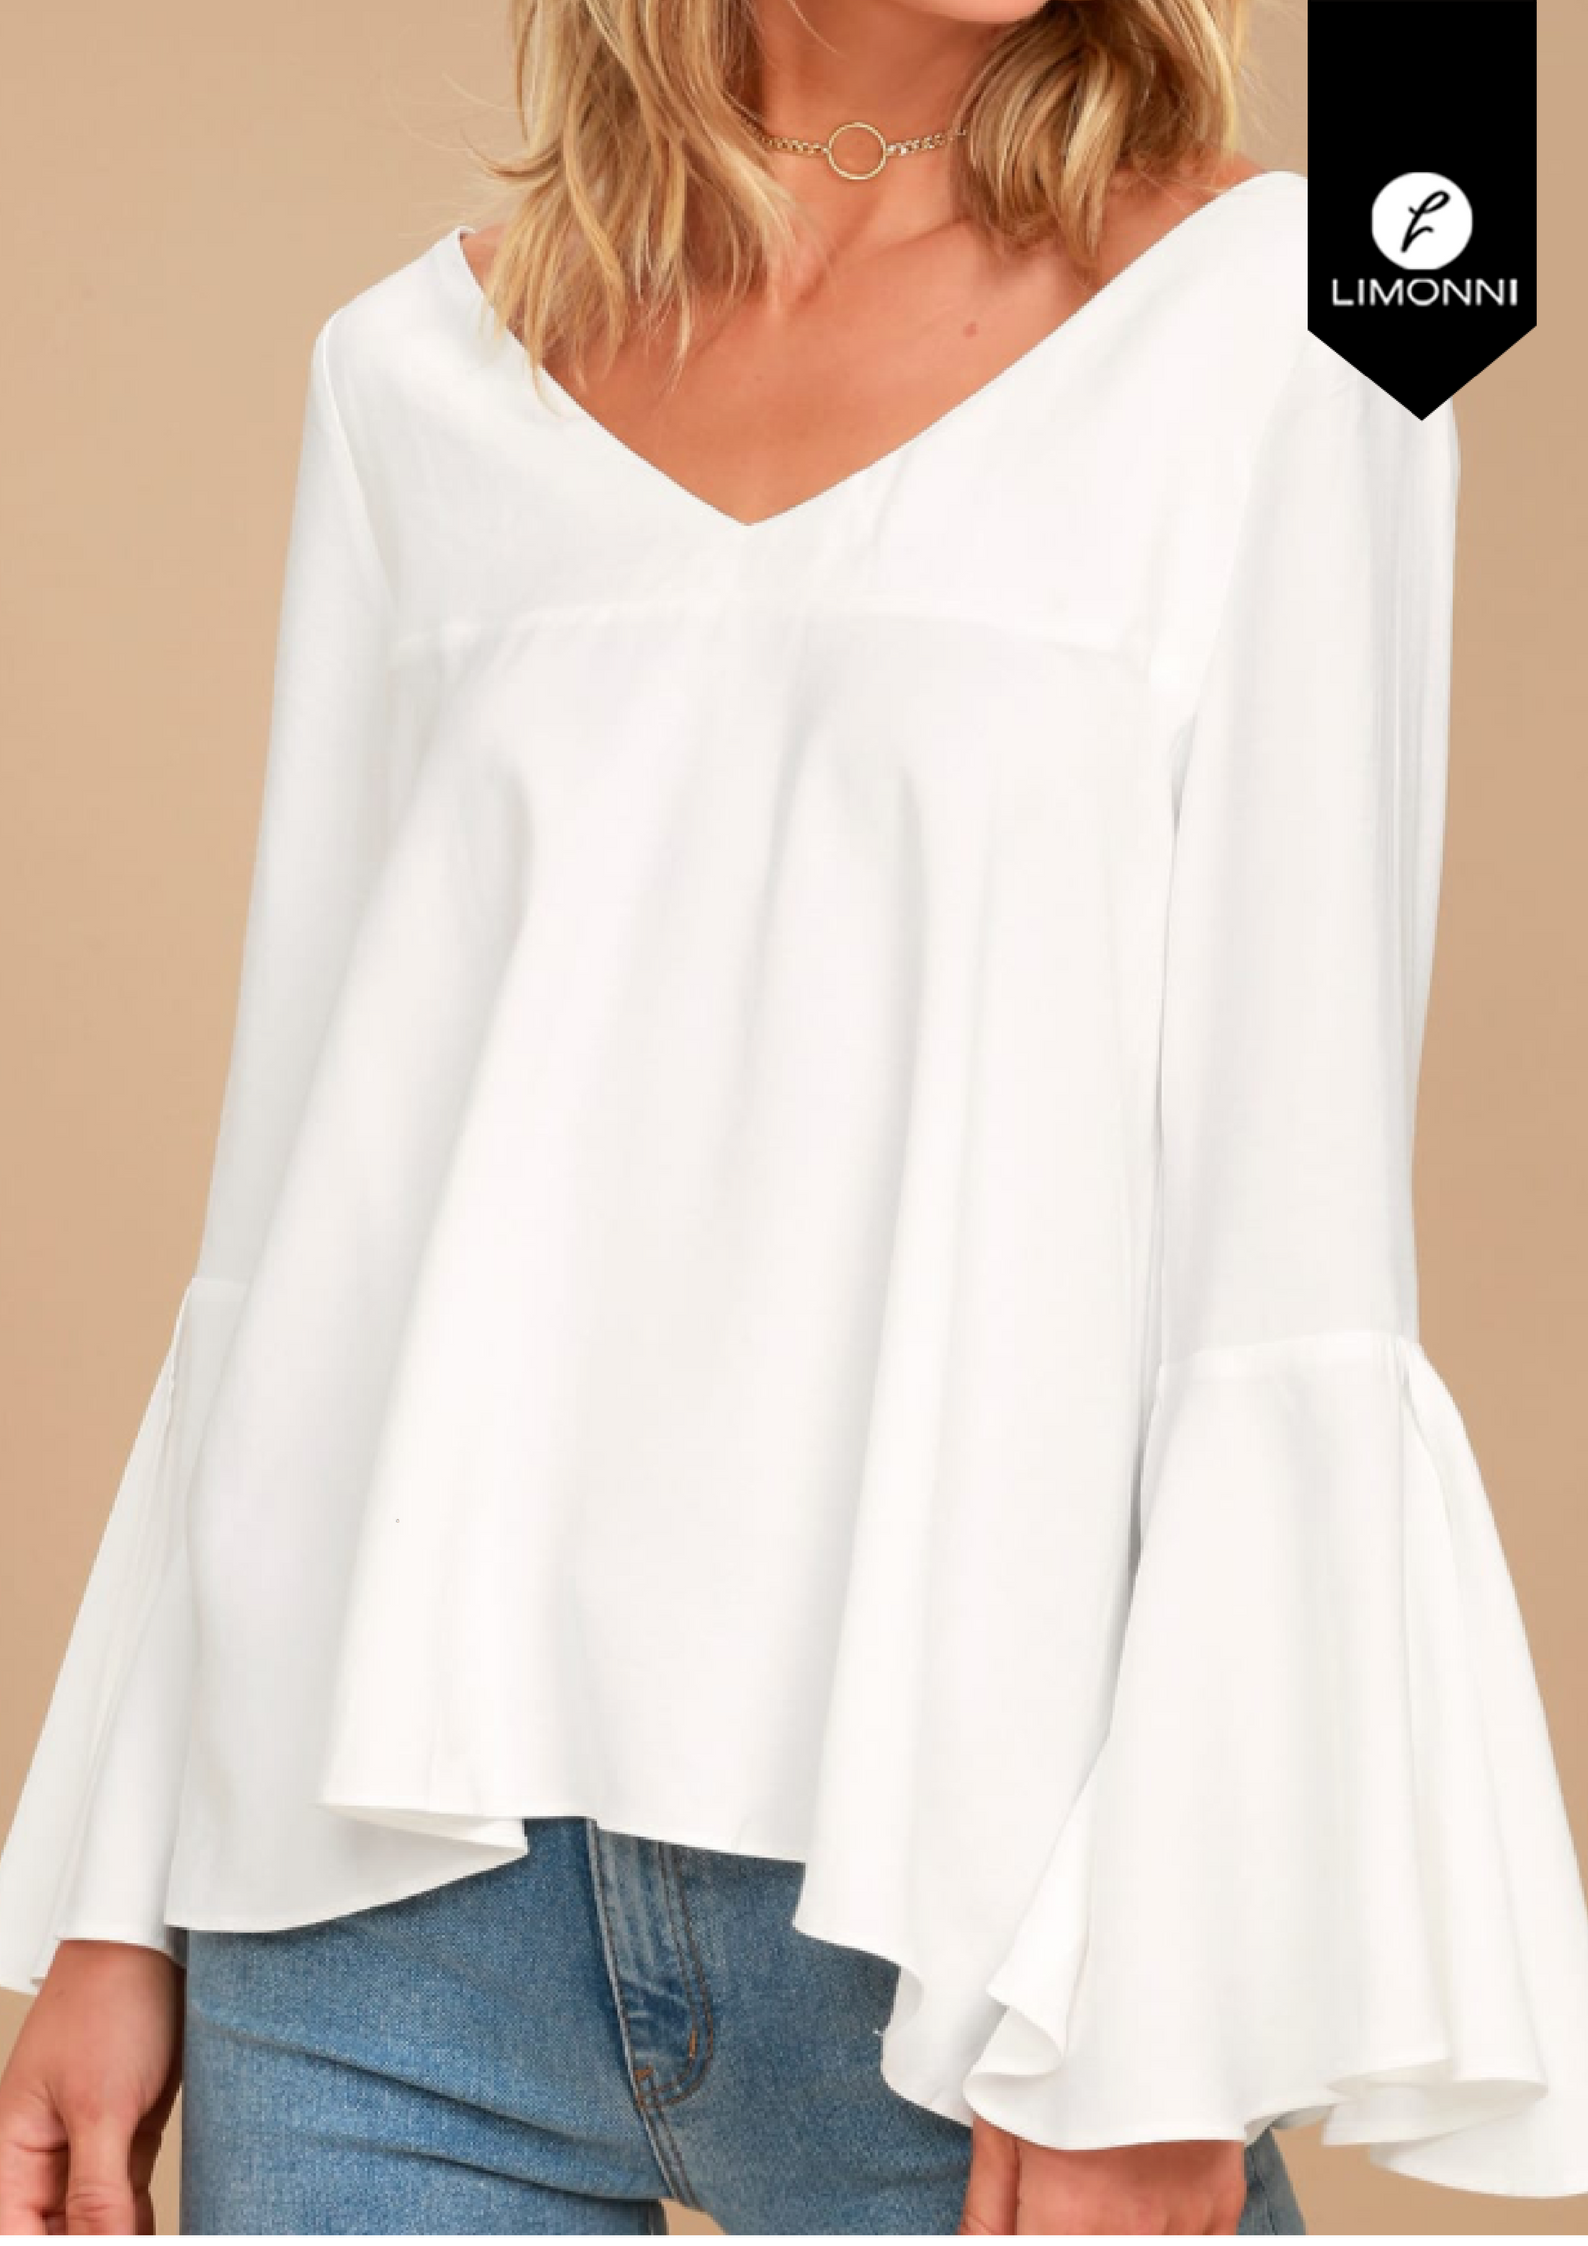 Blusas para mujer Limonni Bennett LI1386 Campesinas